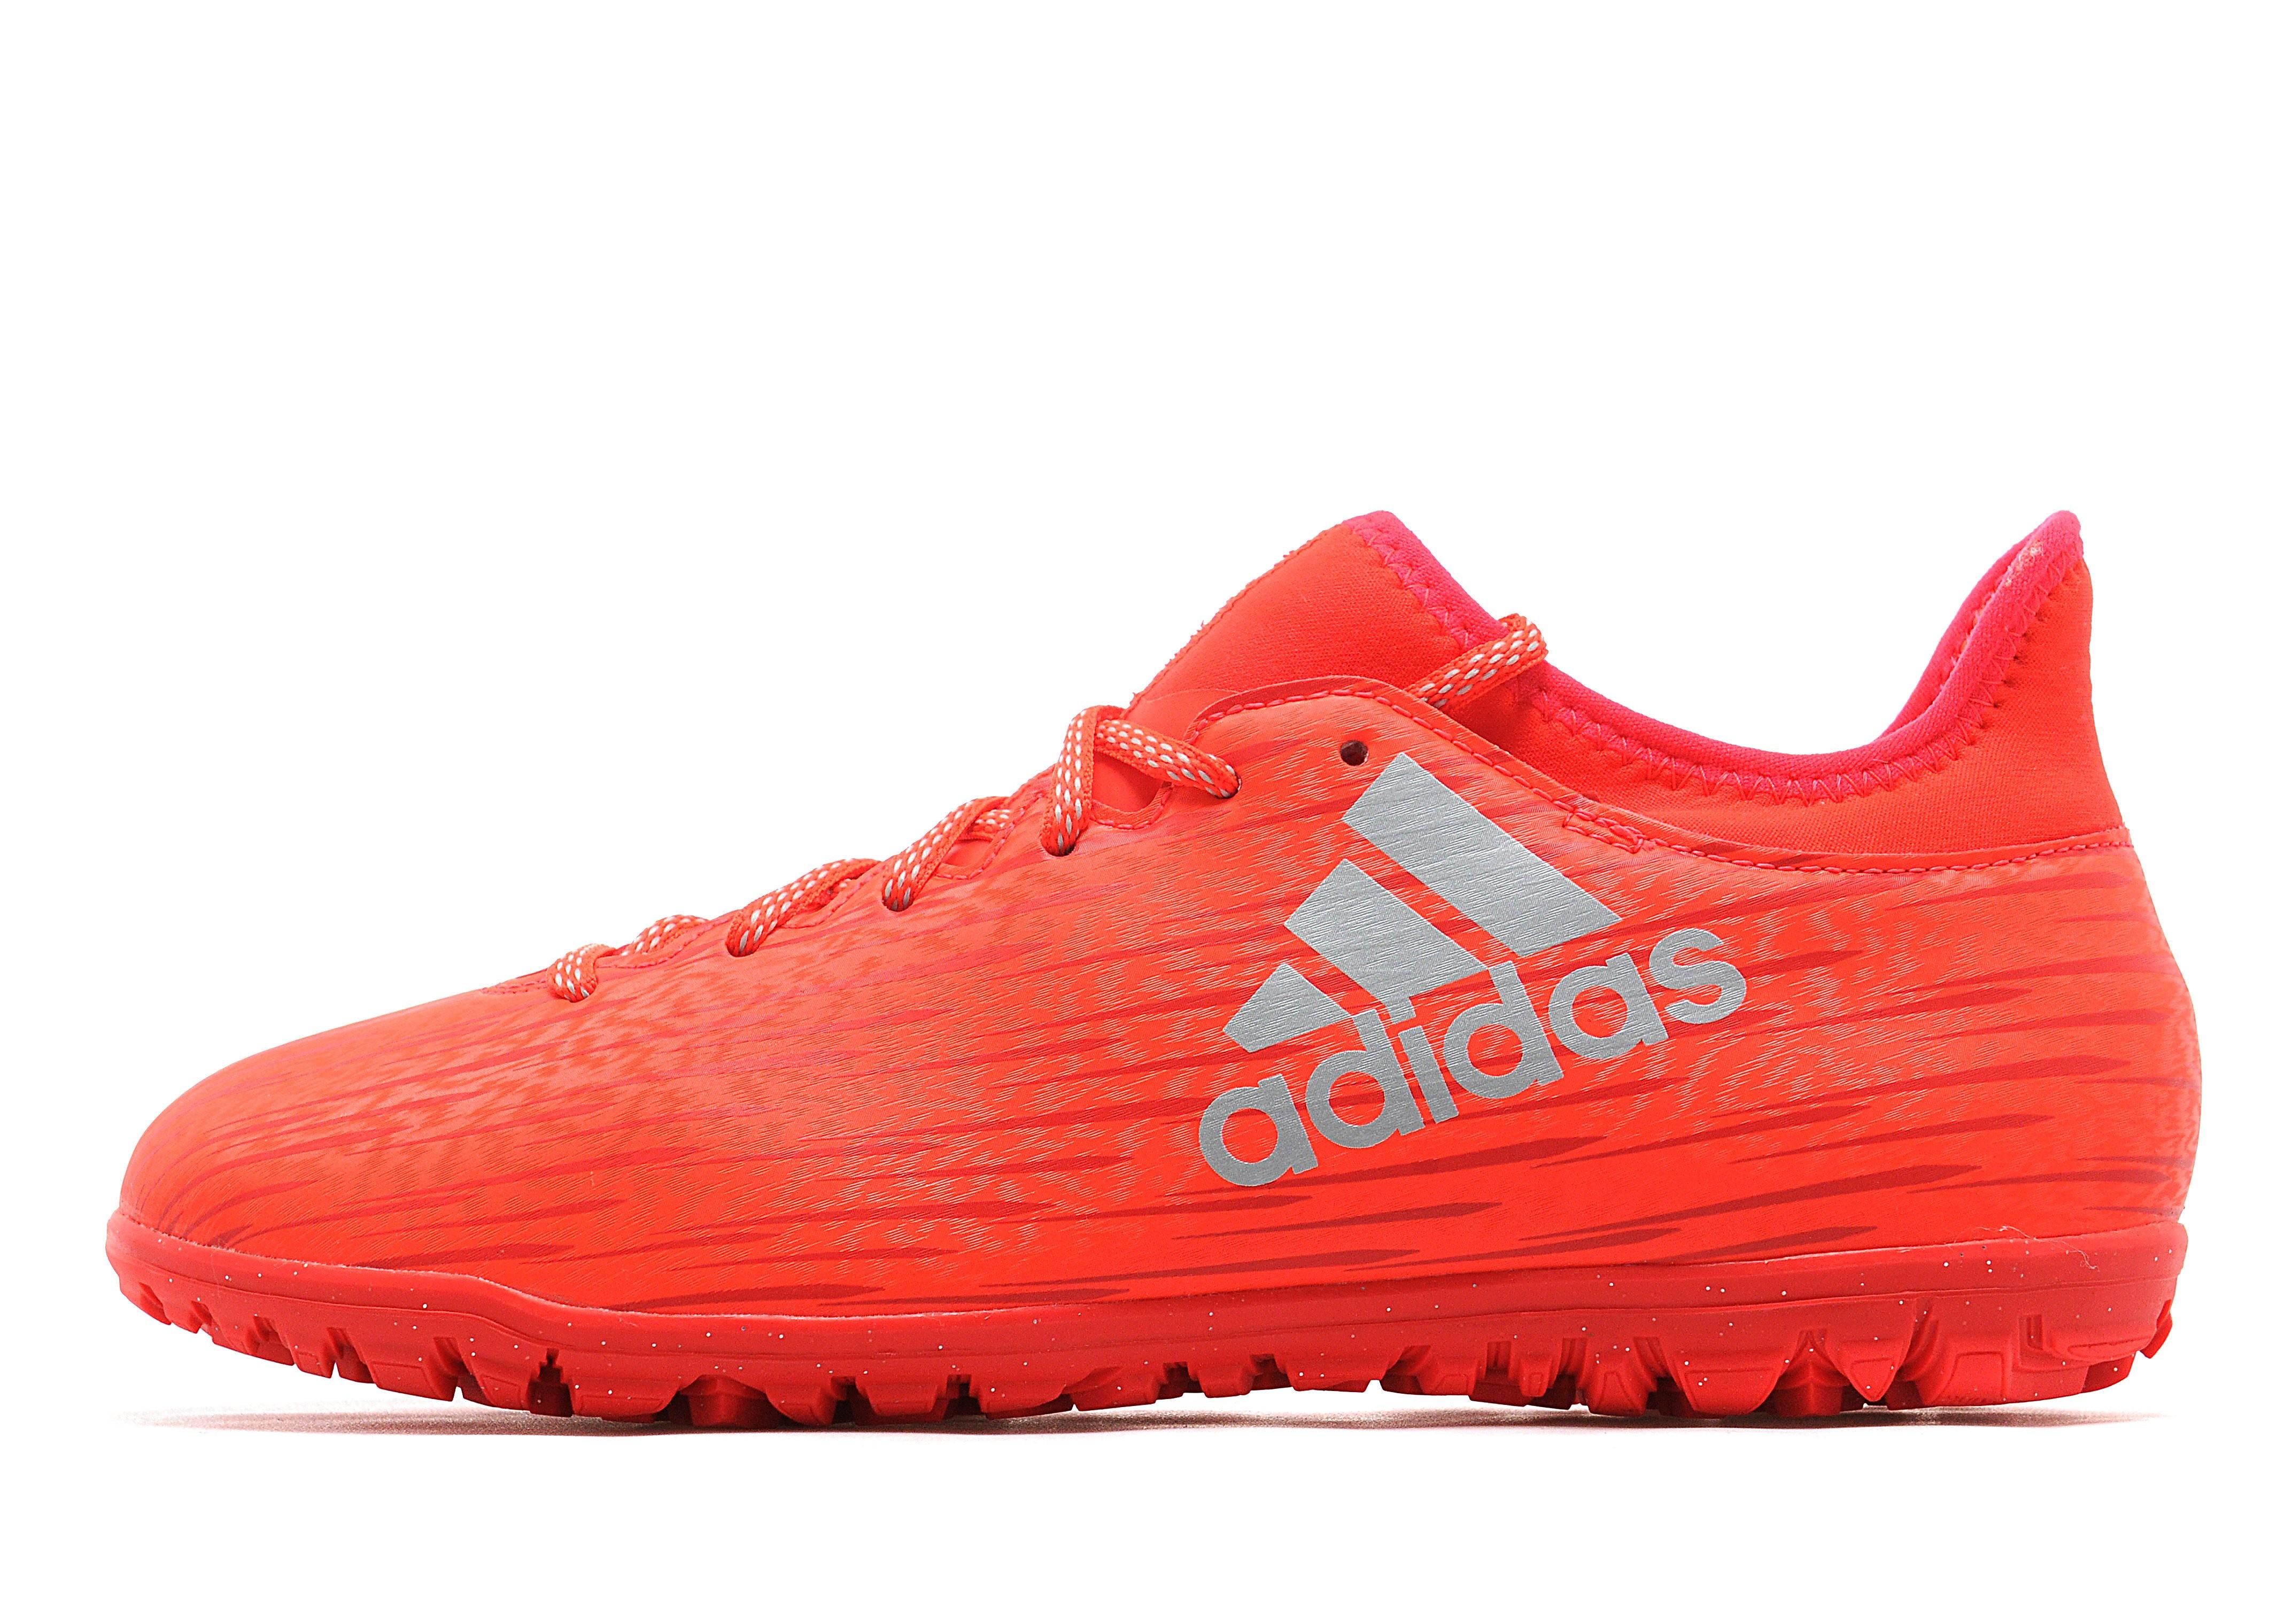 adidas X 16.3 Turf - Solar Red - Mens - Sports King Store af4b38388a20